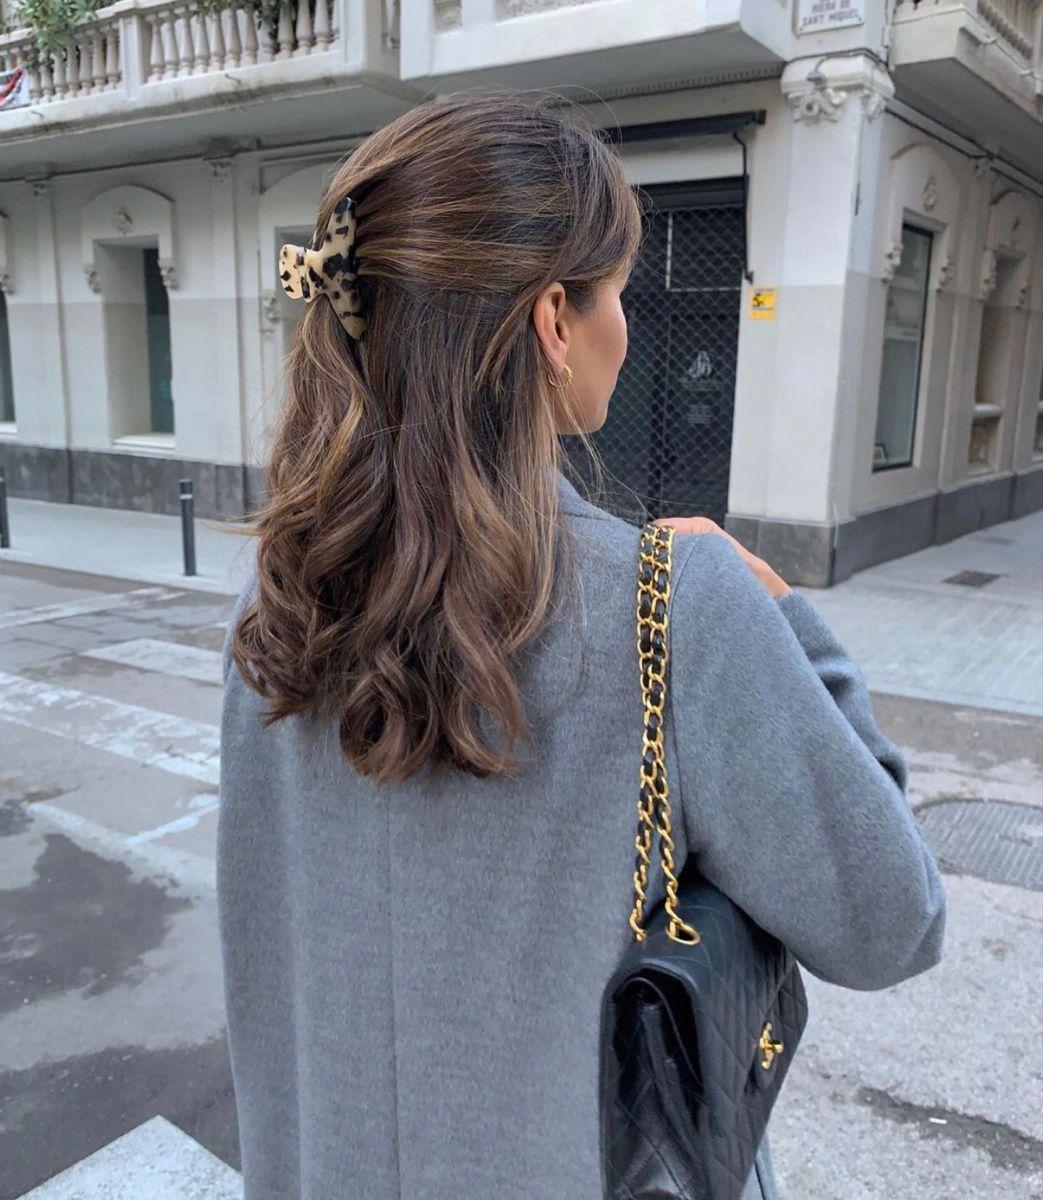 Tortoiseshell Hair claw clip - Minimalist curves claw clip